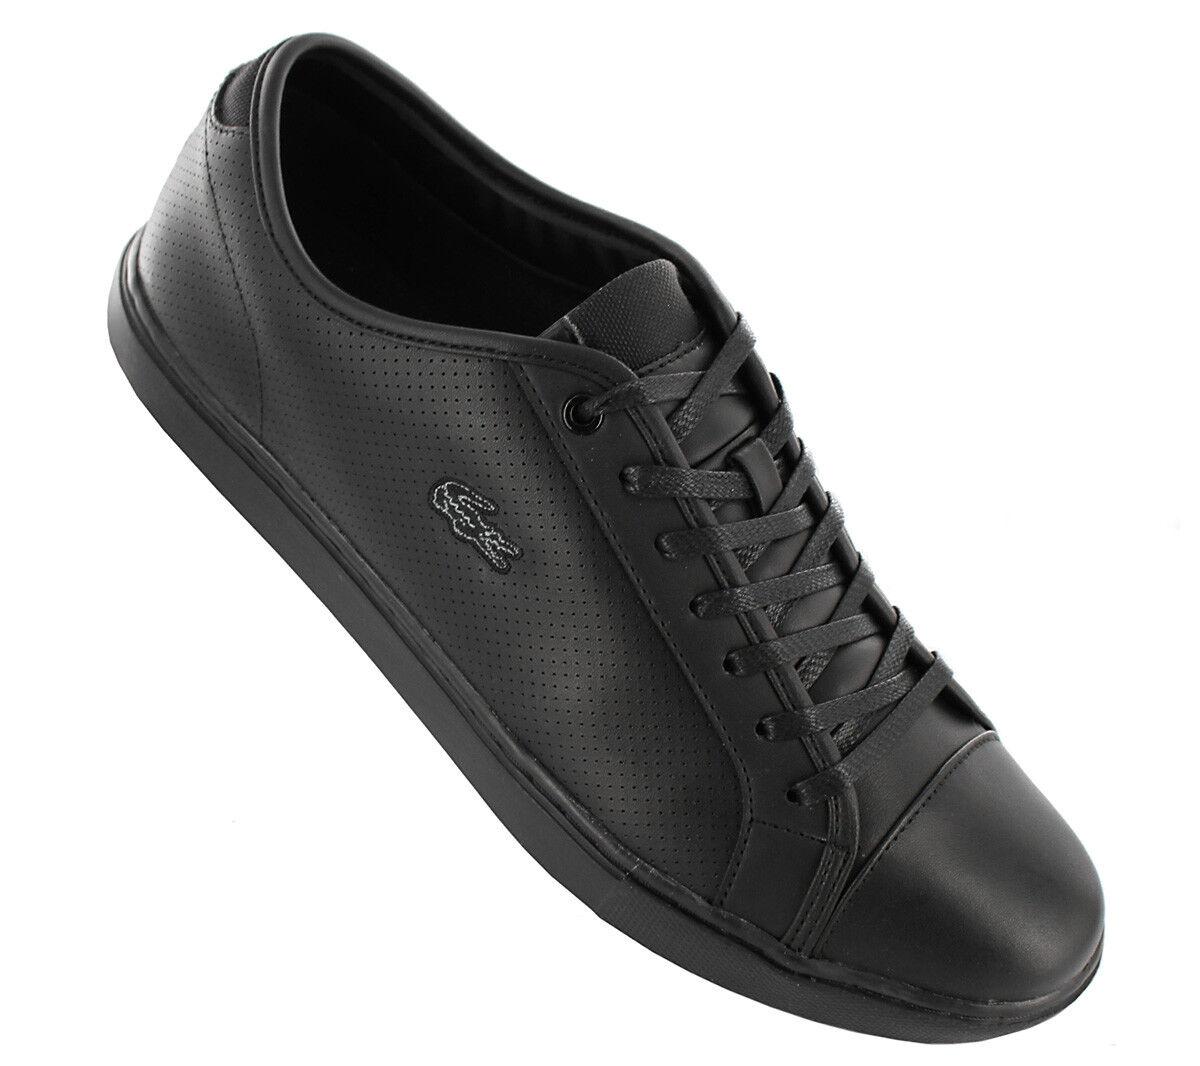 NEW Lacoste Showcourt CTR SPM 7-28SPM022802H Men''s shoes Trainers Sneakers SALE